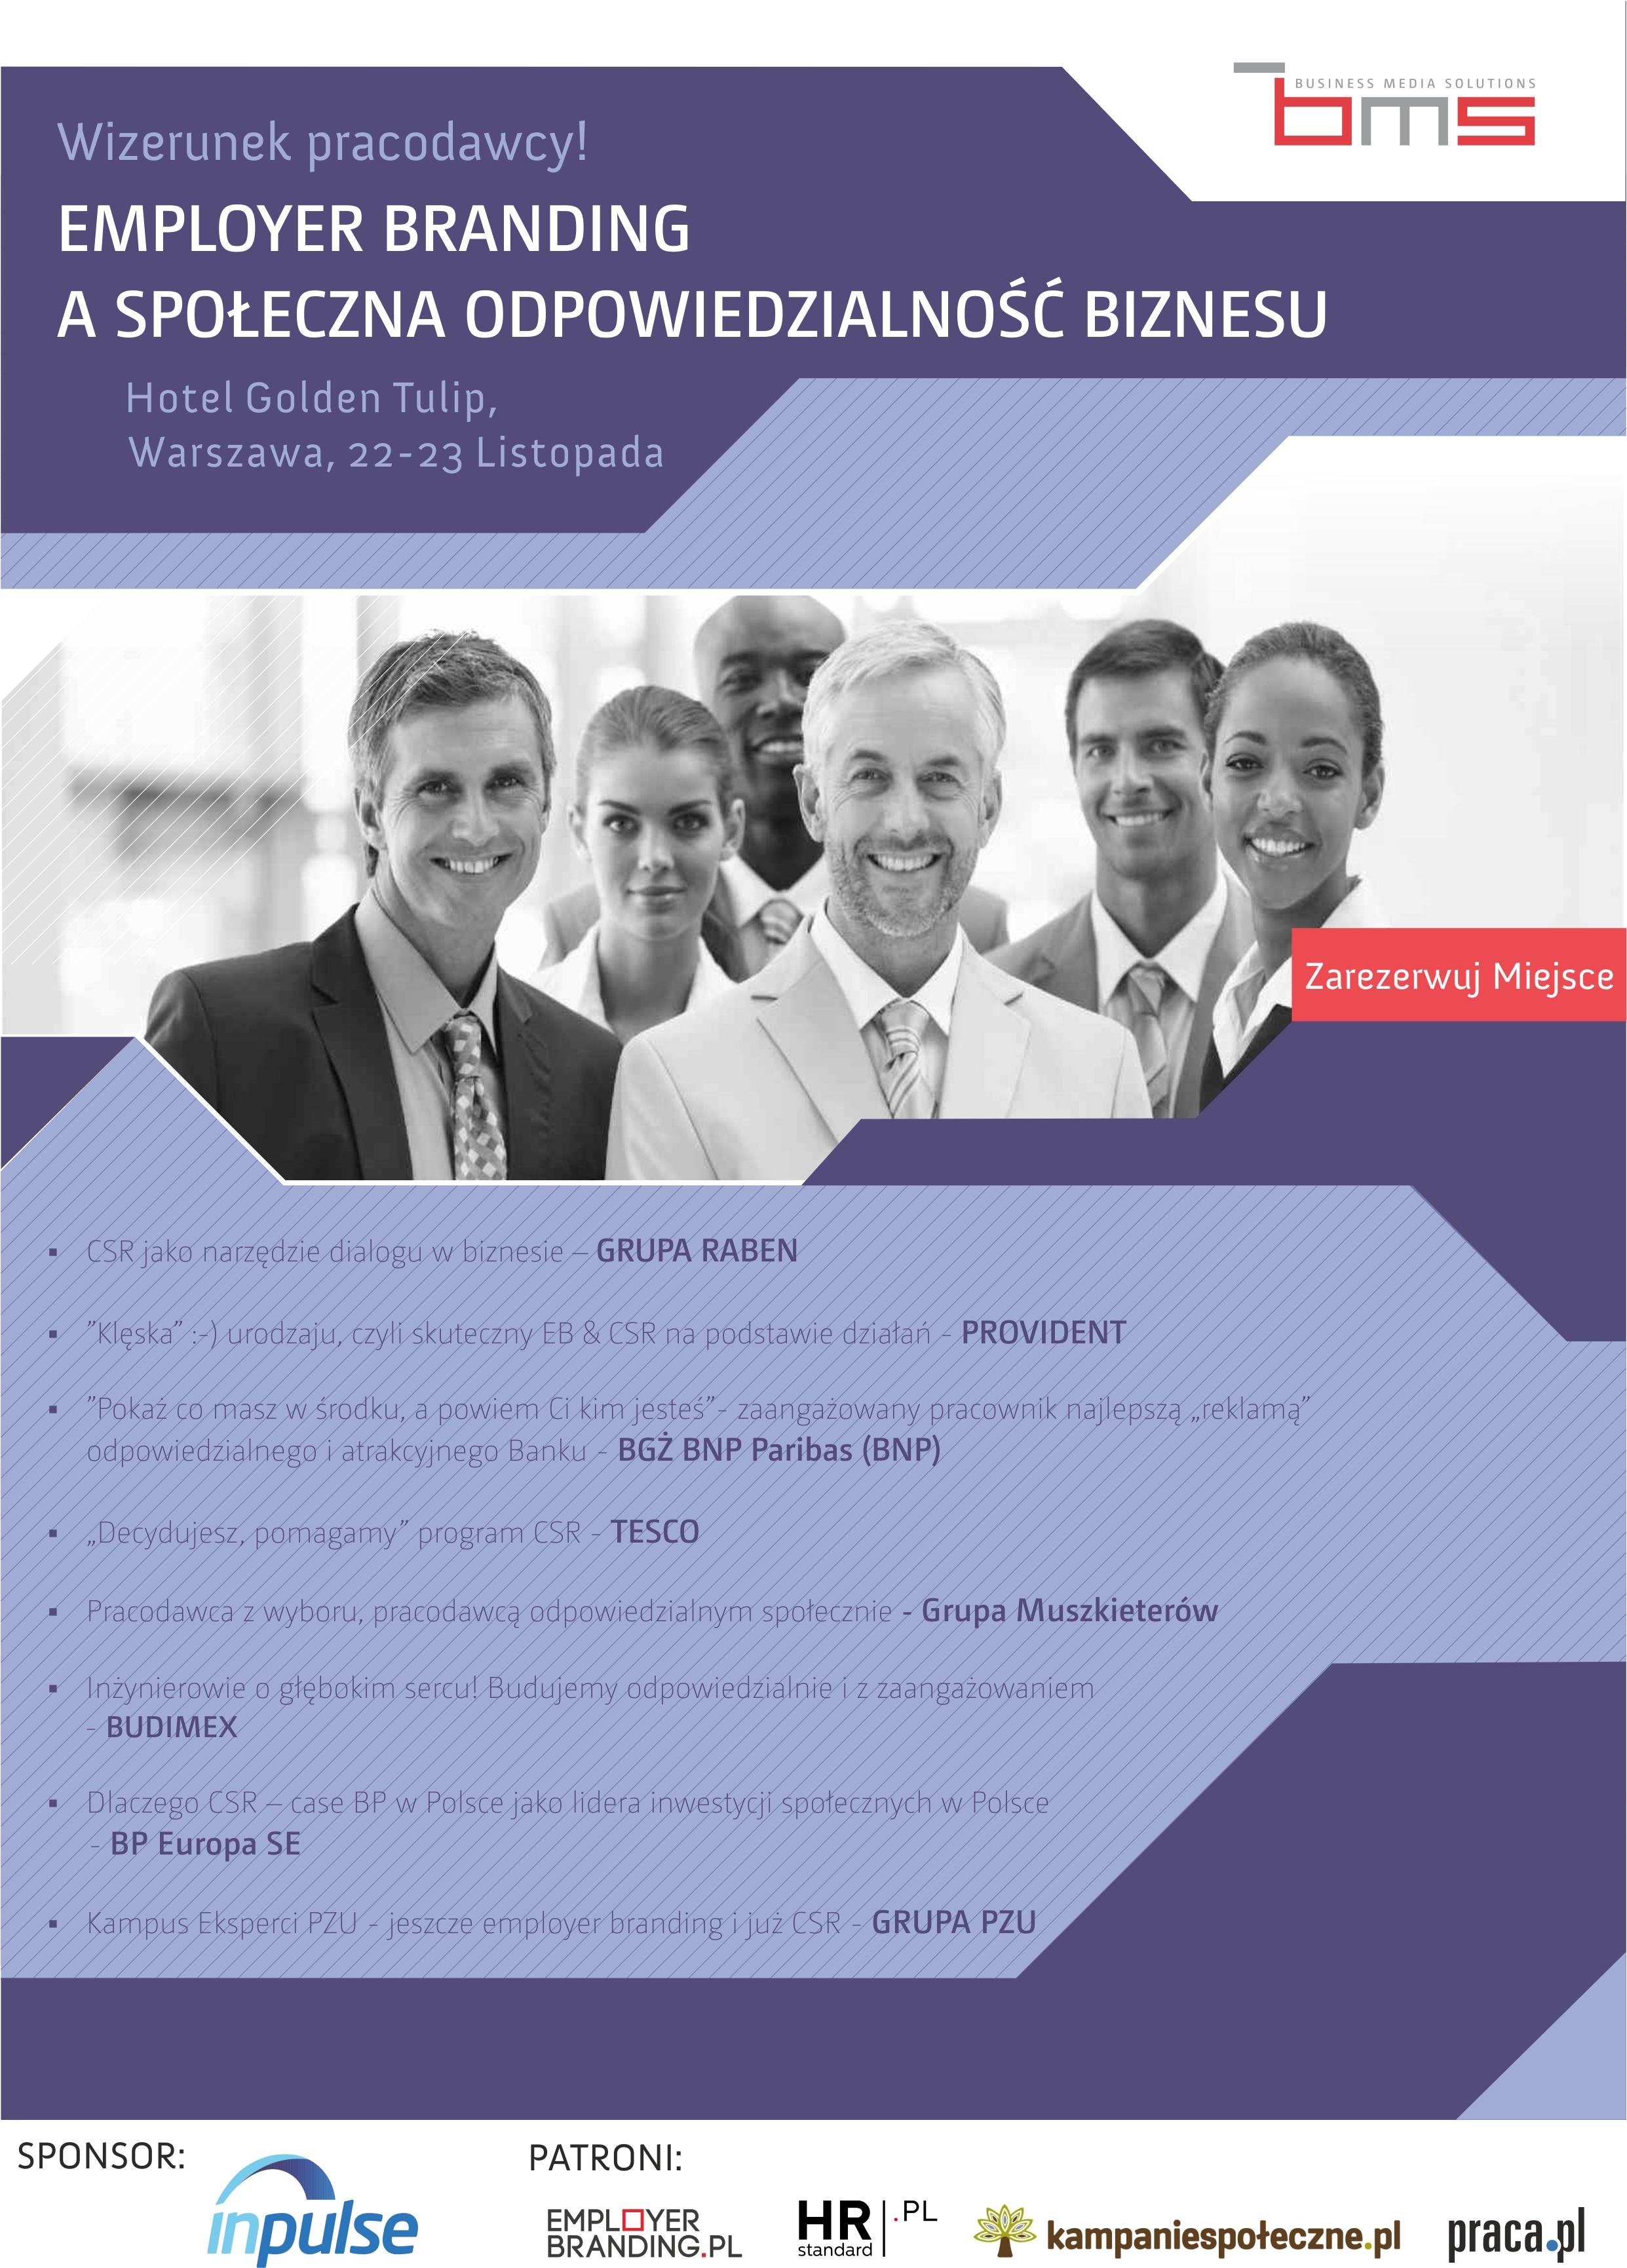 csr-employer-branding-22-23-11-2016-r-okladka-na-strone